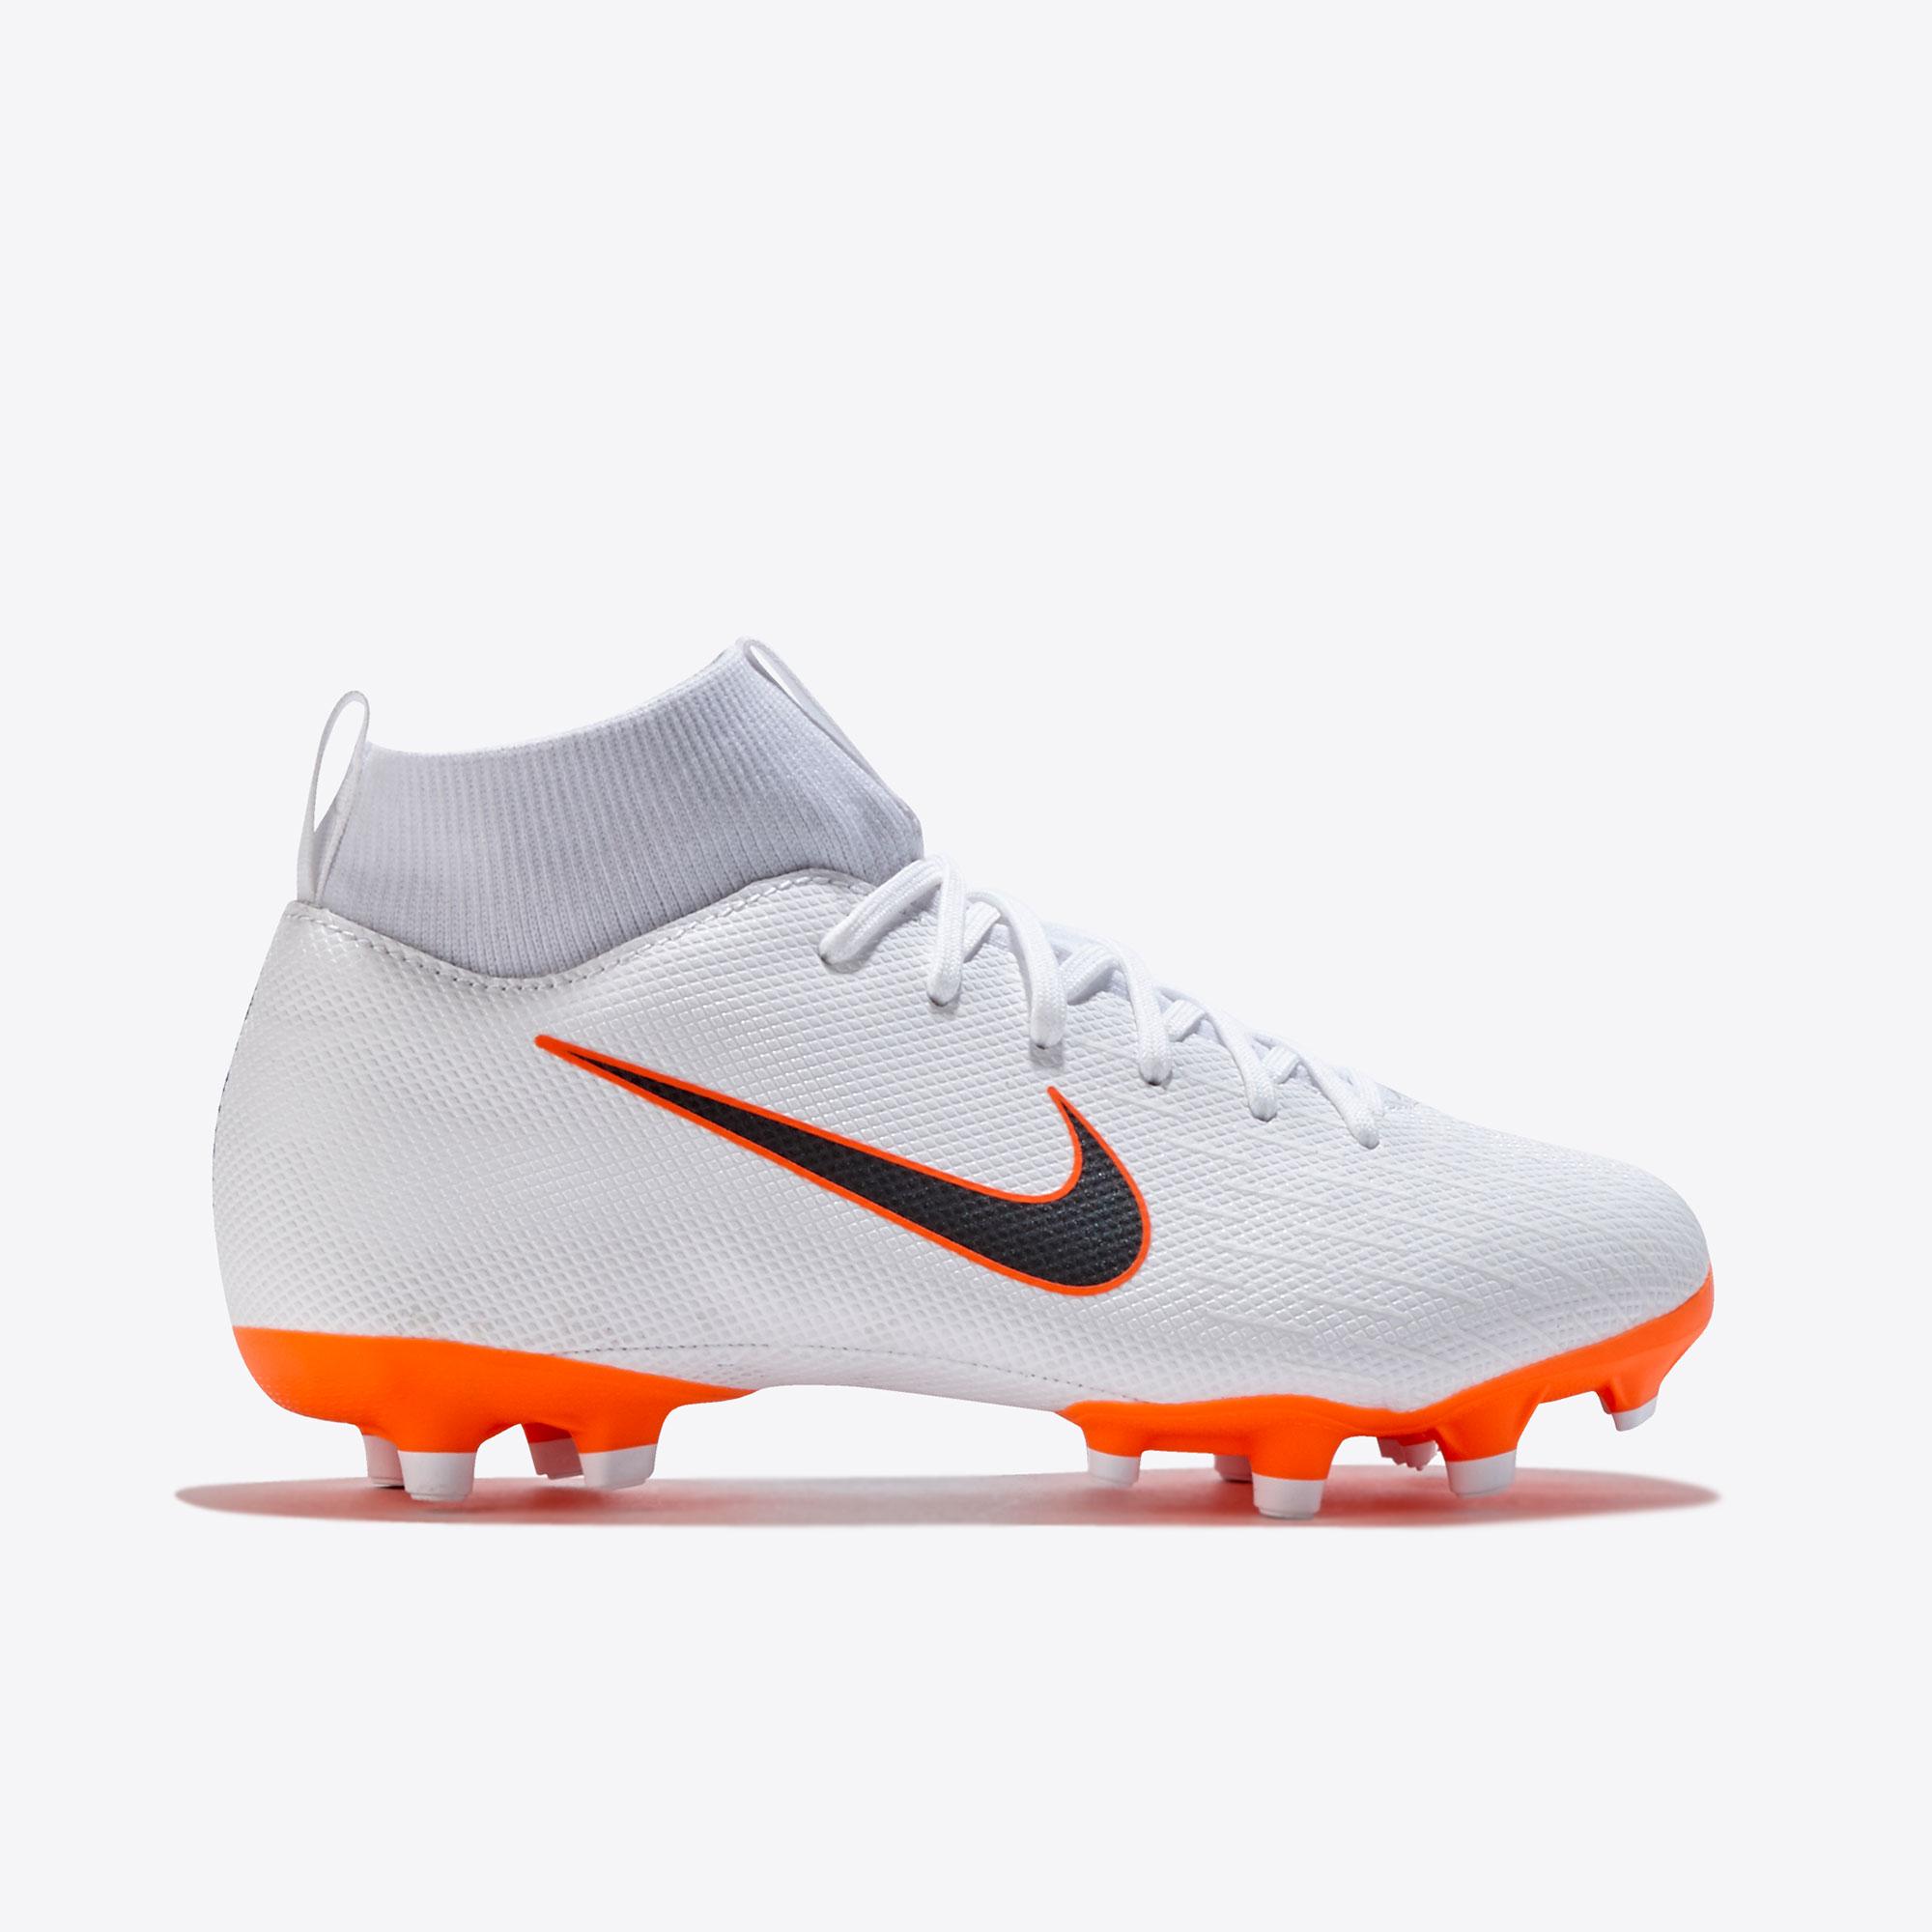 Chaussures de football Nike Mercurial Superfly6 Academy multi-terrains - Enfants